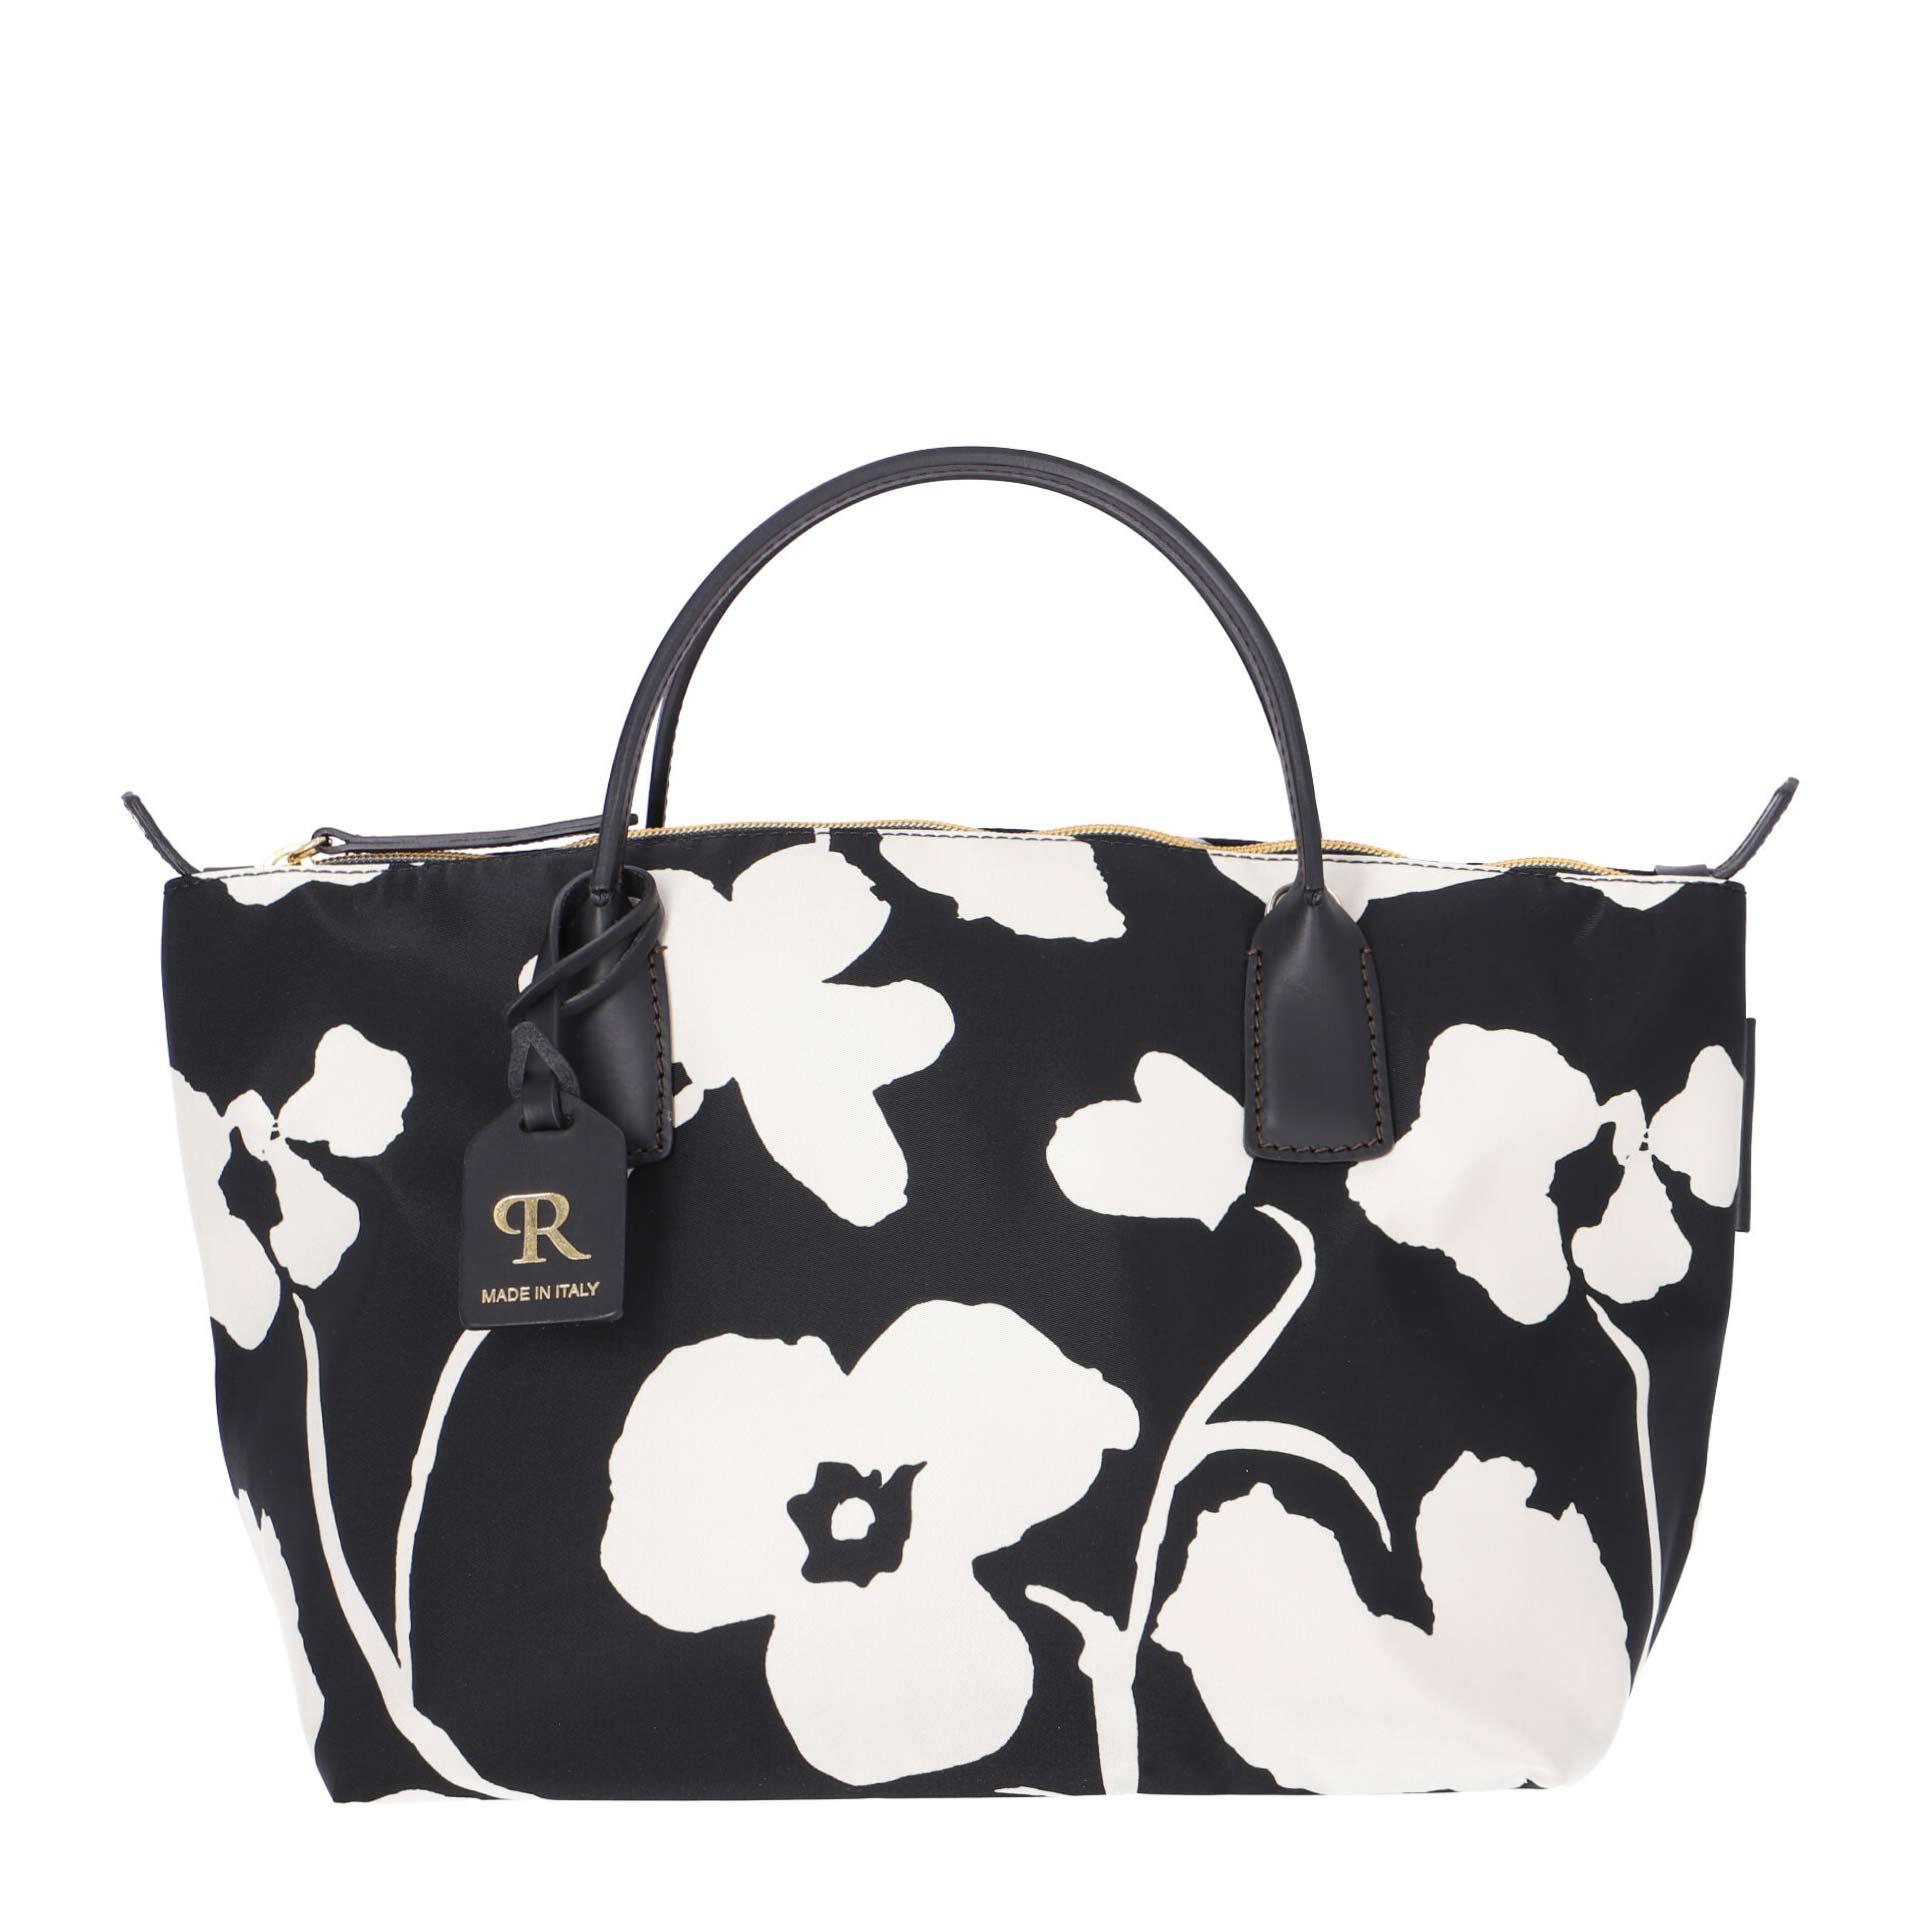 Robertina Handtasche S Flower Firman schwarz